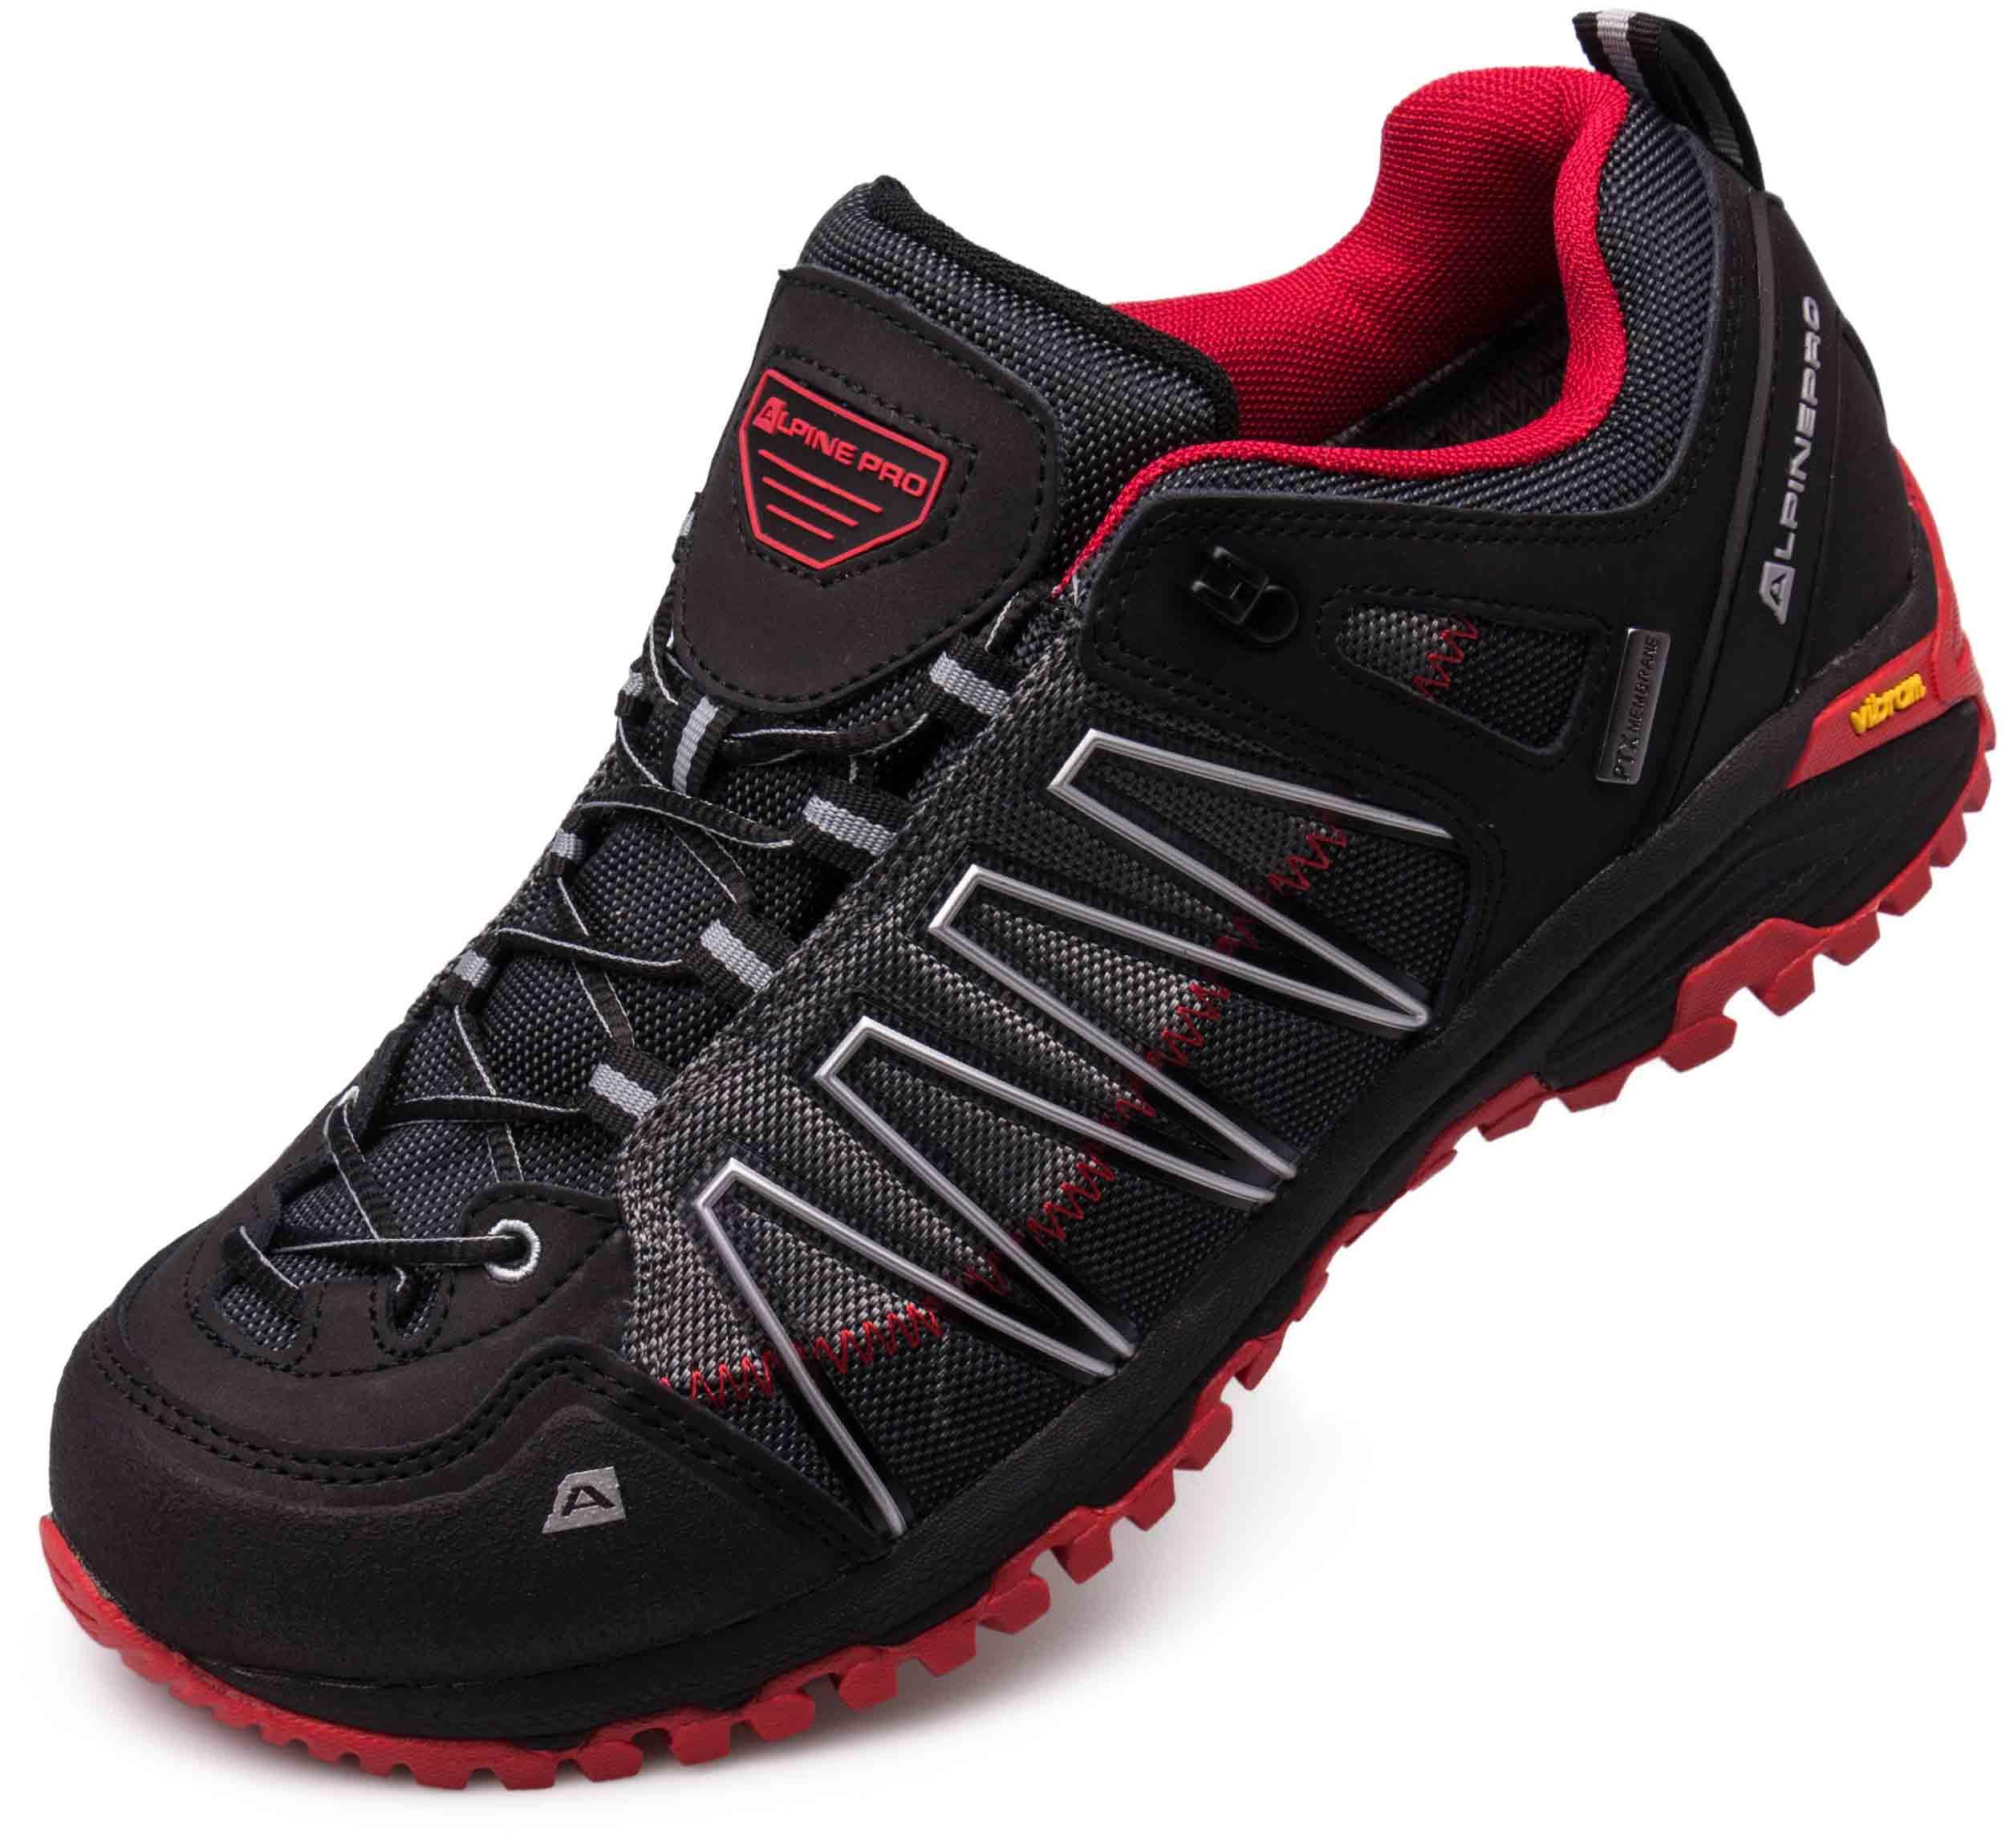 Obuv   Outdoorová obuv Alpine Pro Triglav 3 PTX Low a7c40677003